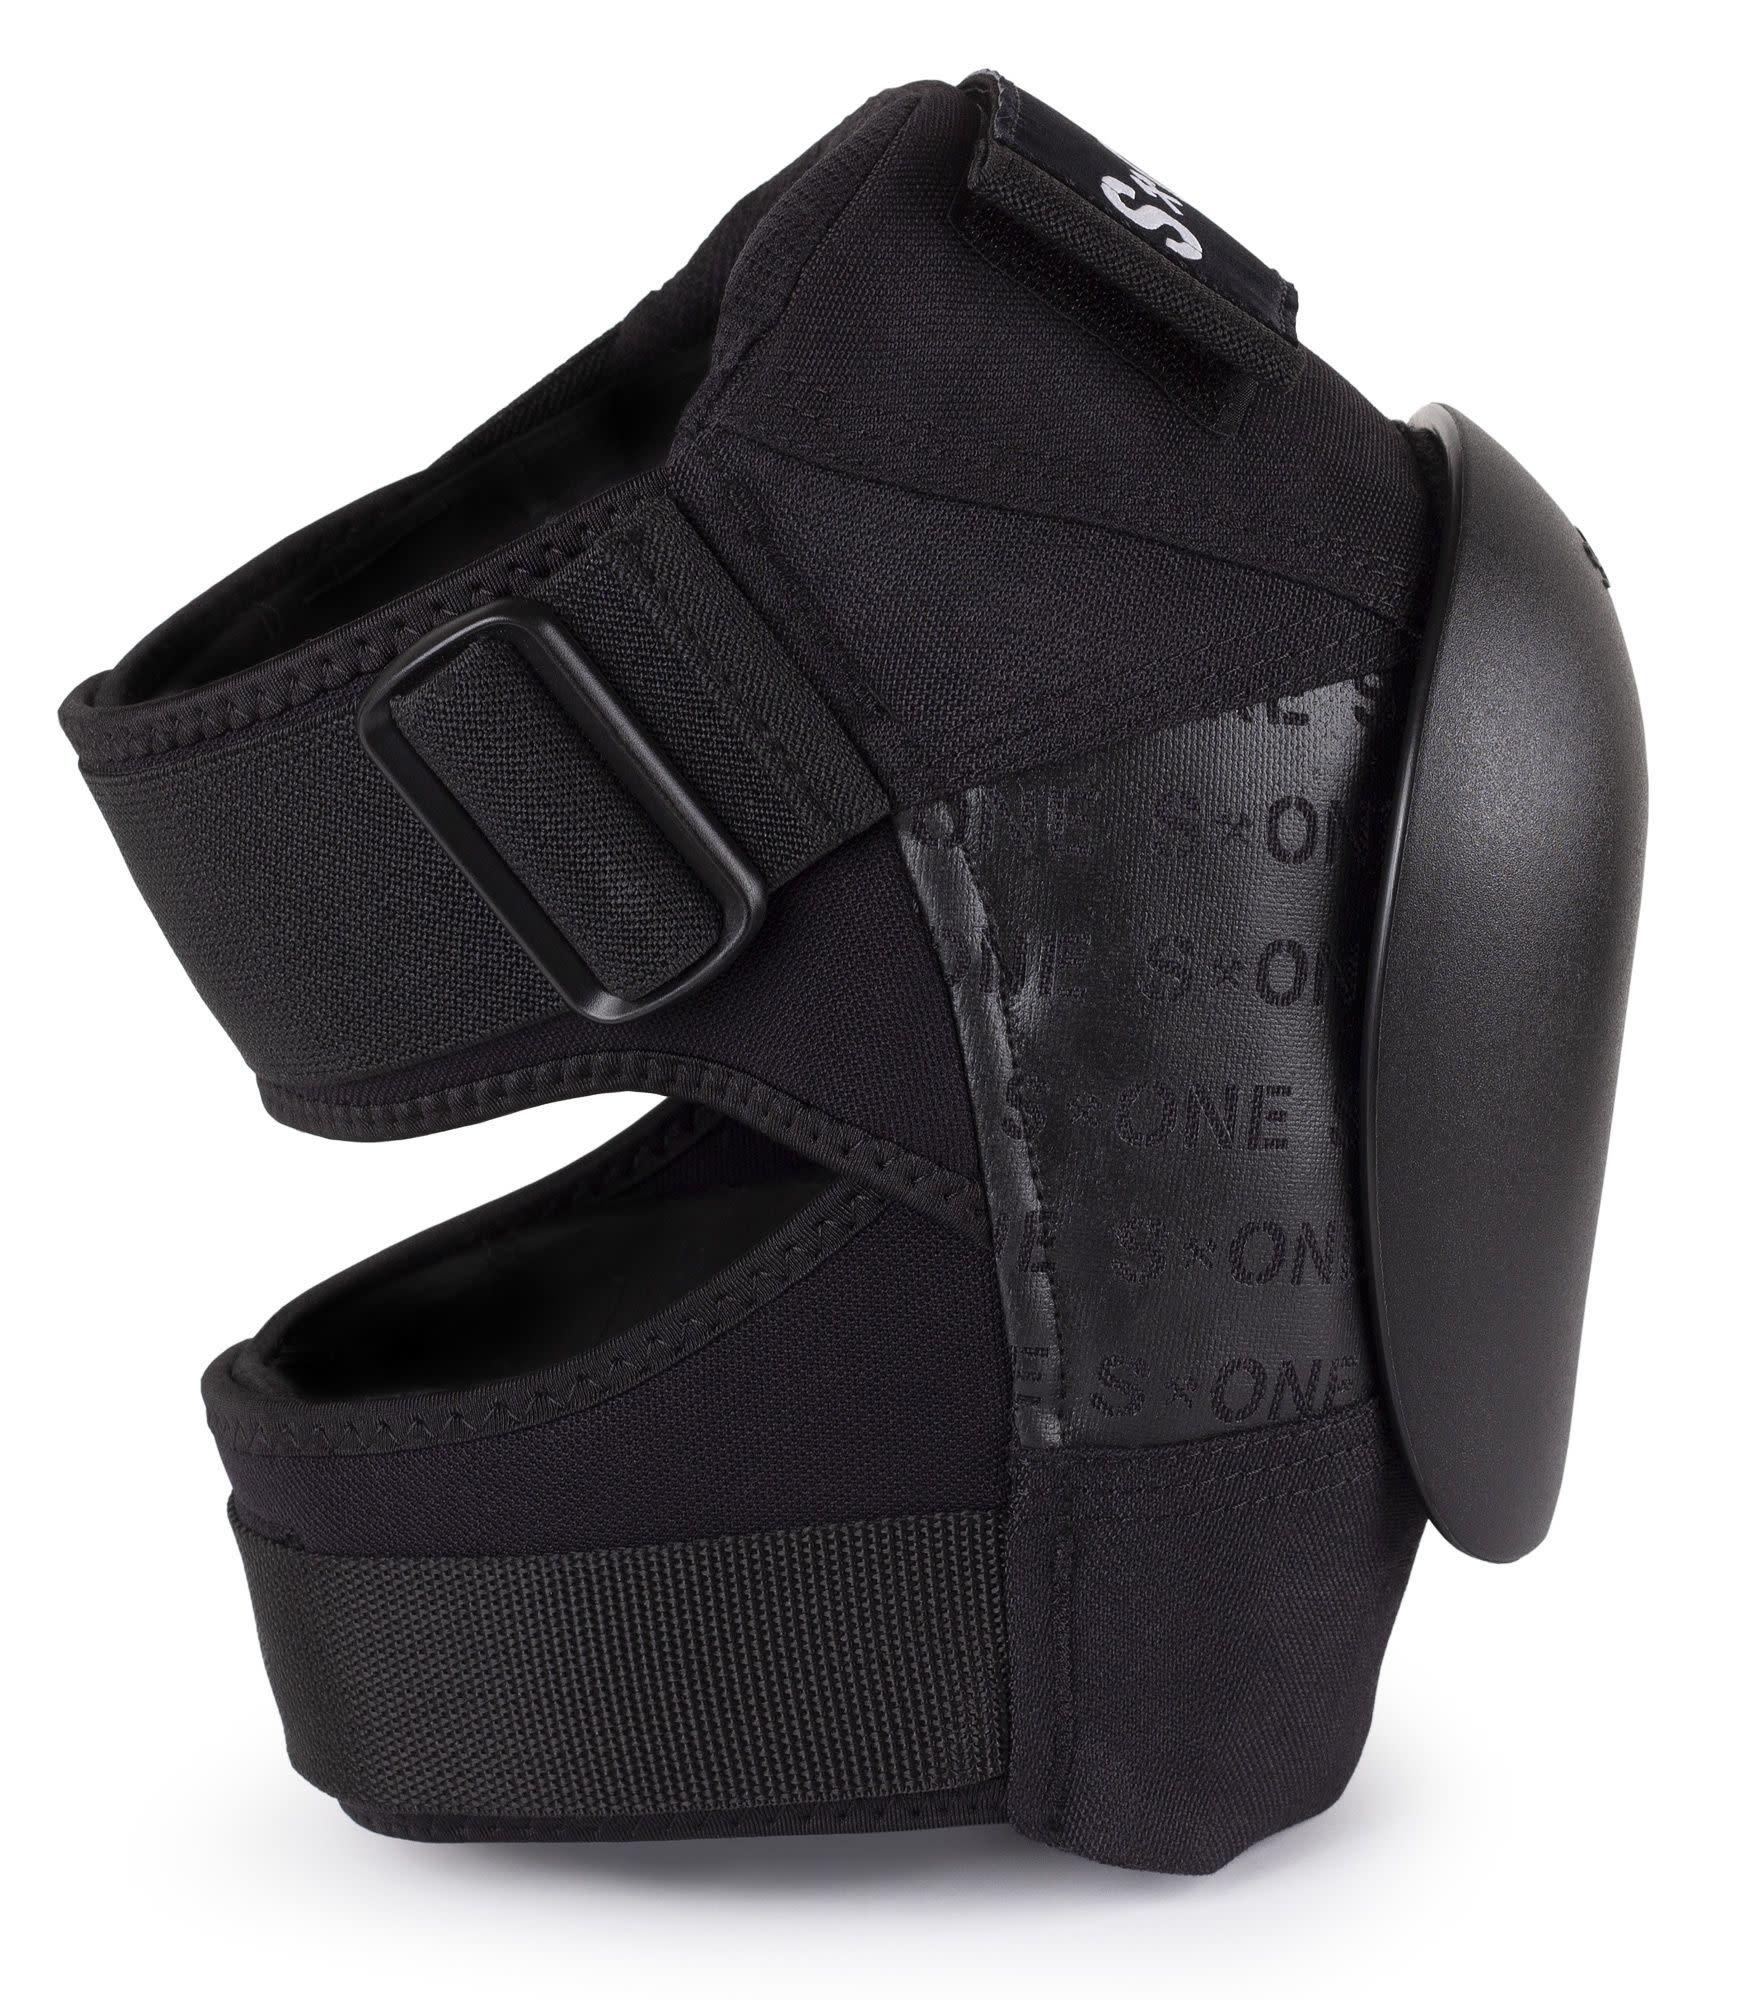 S-1 Pro Knee Pads (4th Gen)